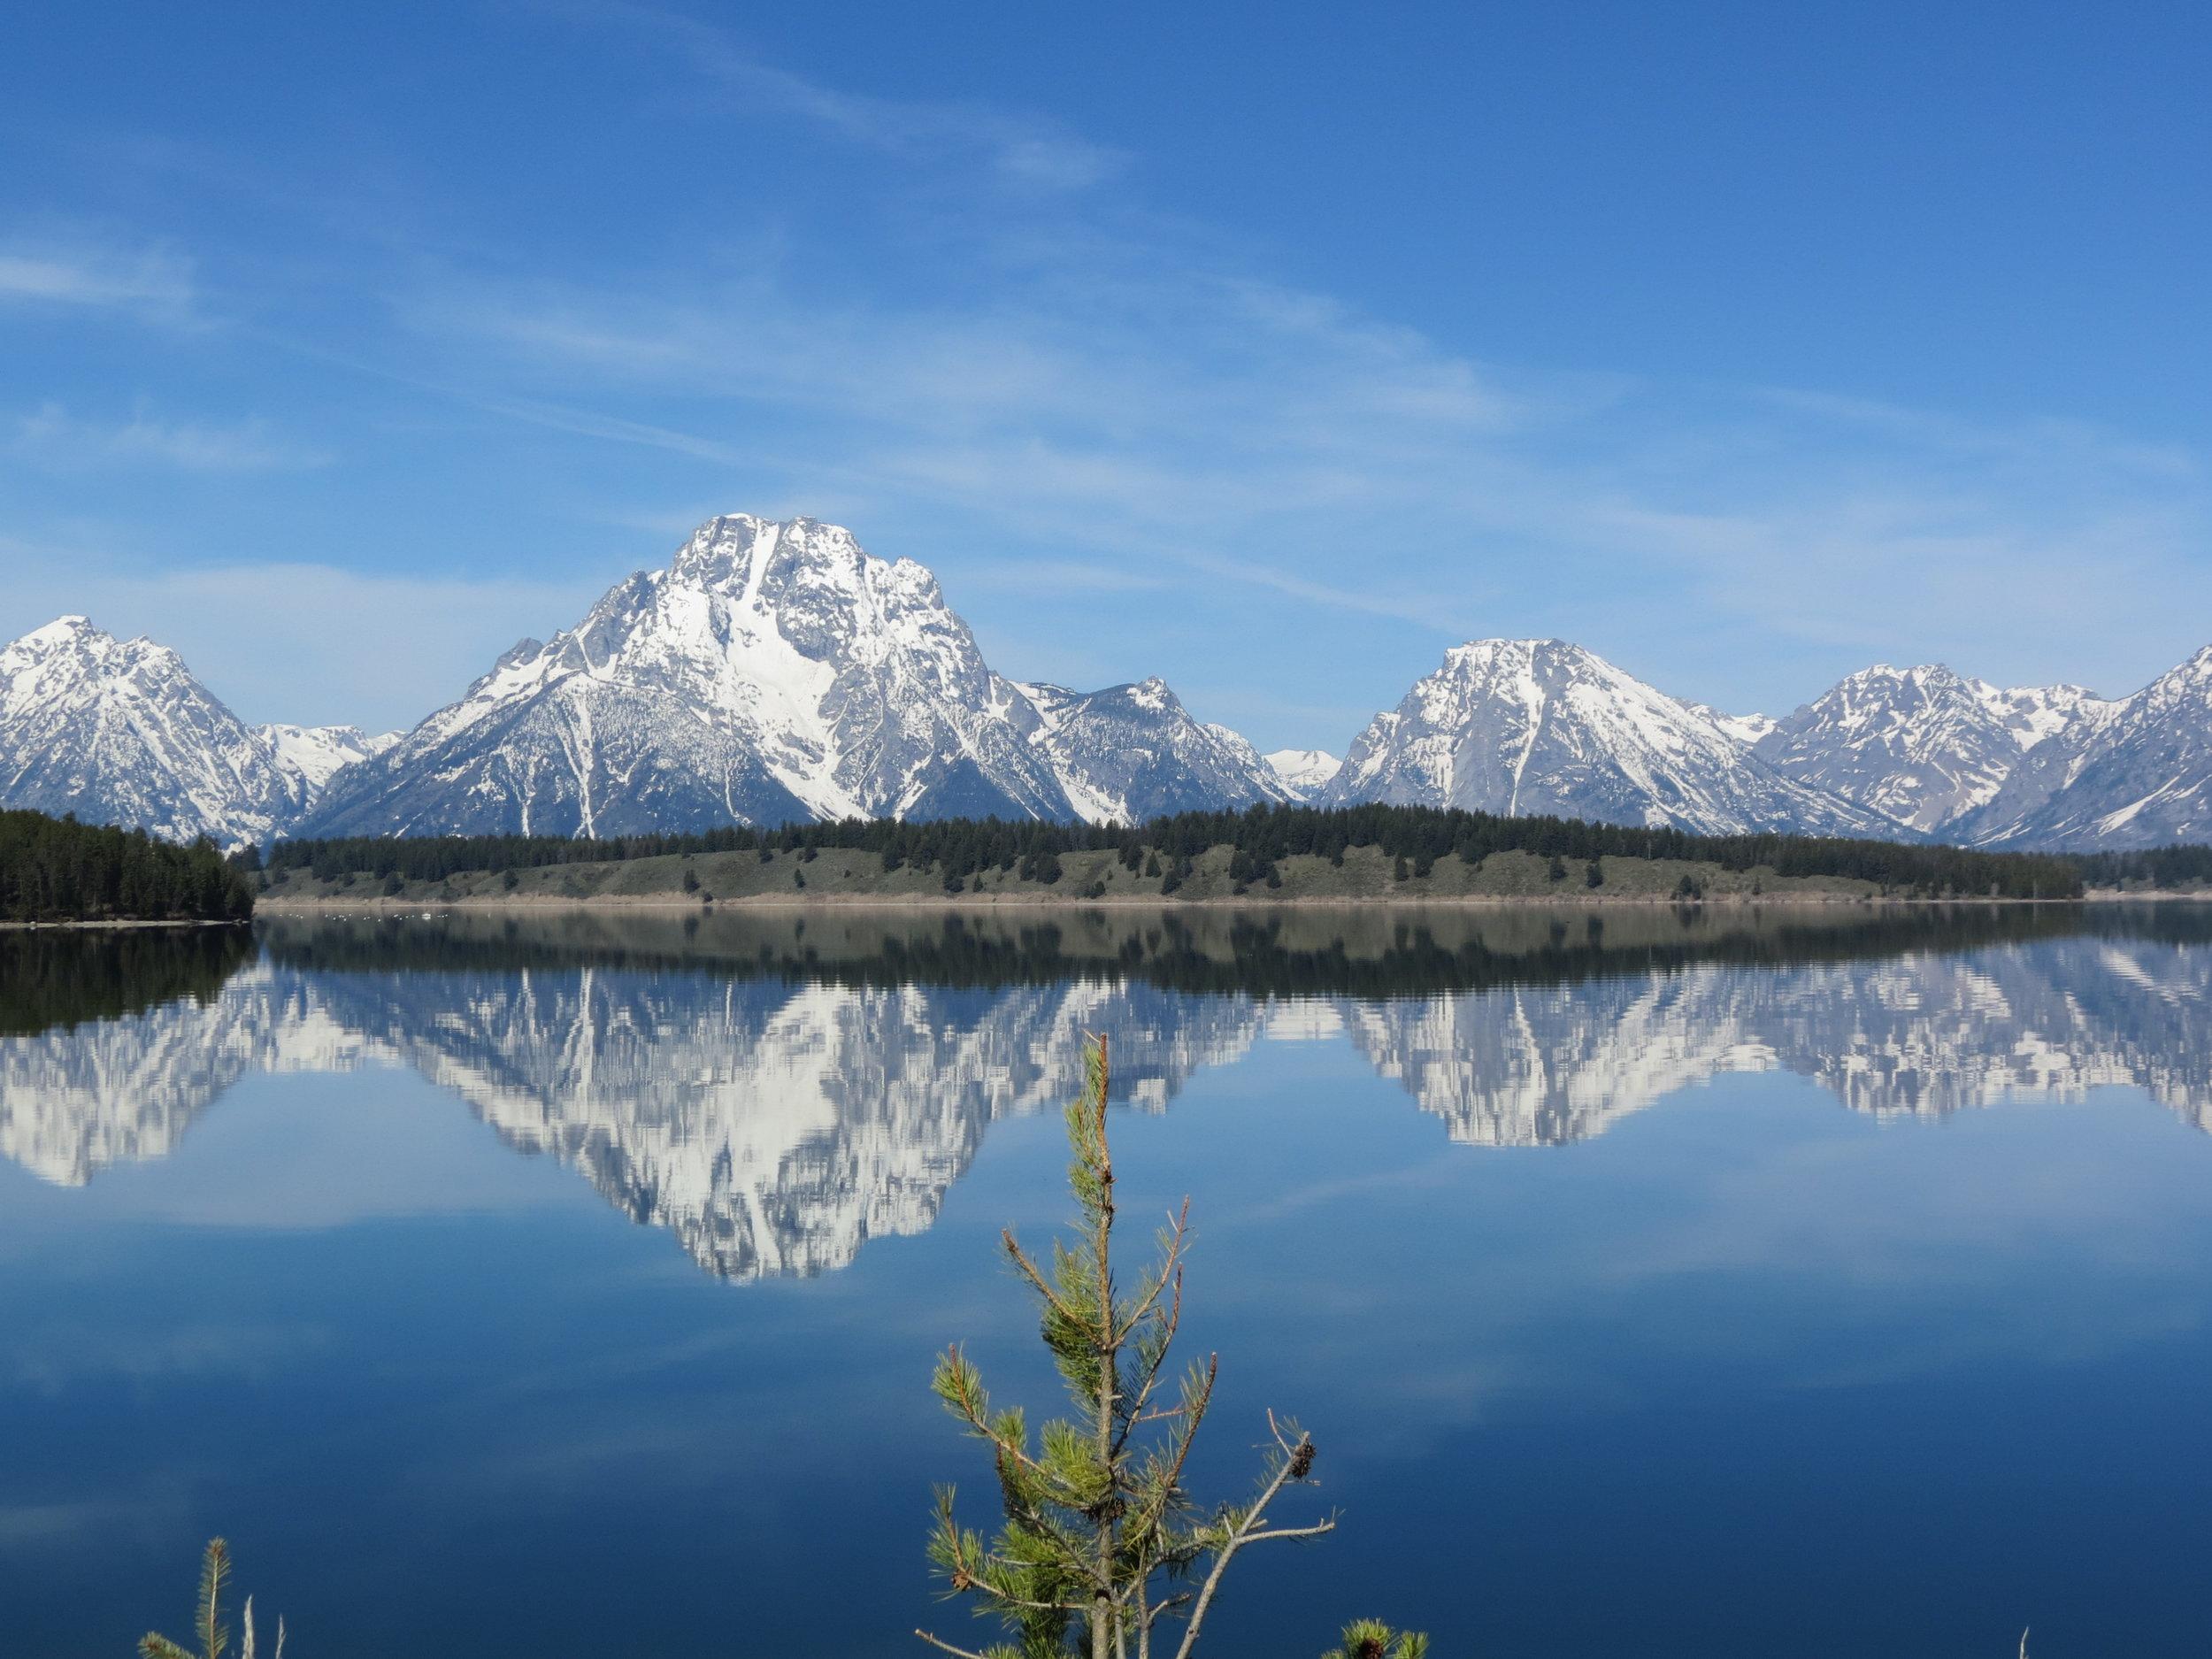 grand teton national park  - jackson lake view - wyoming - 2012